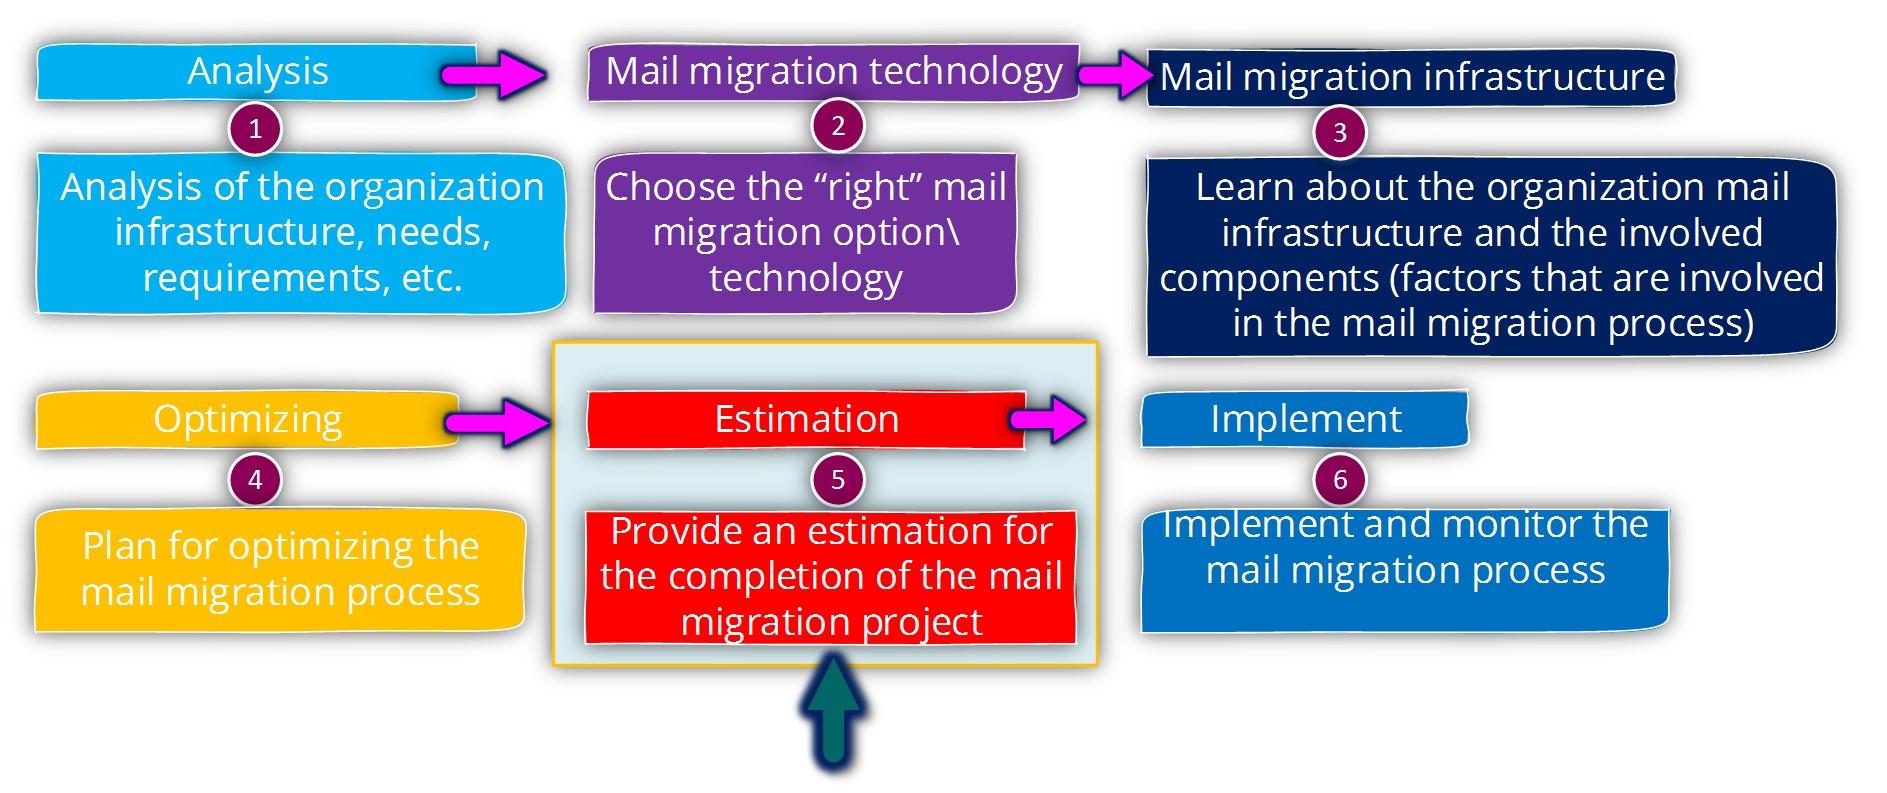 Optimizing the mail migration throughputs-Estimation